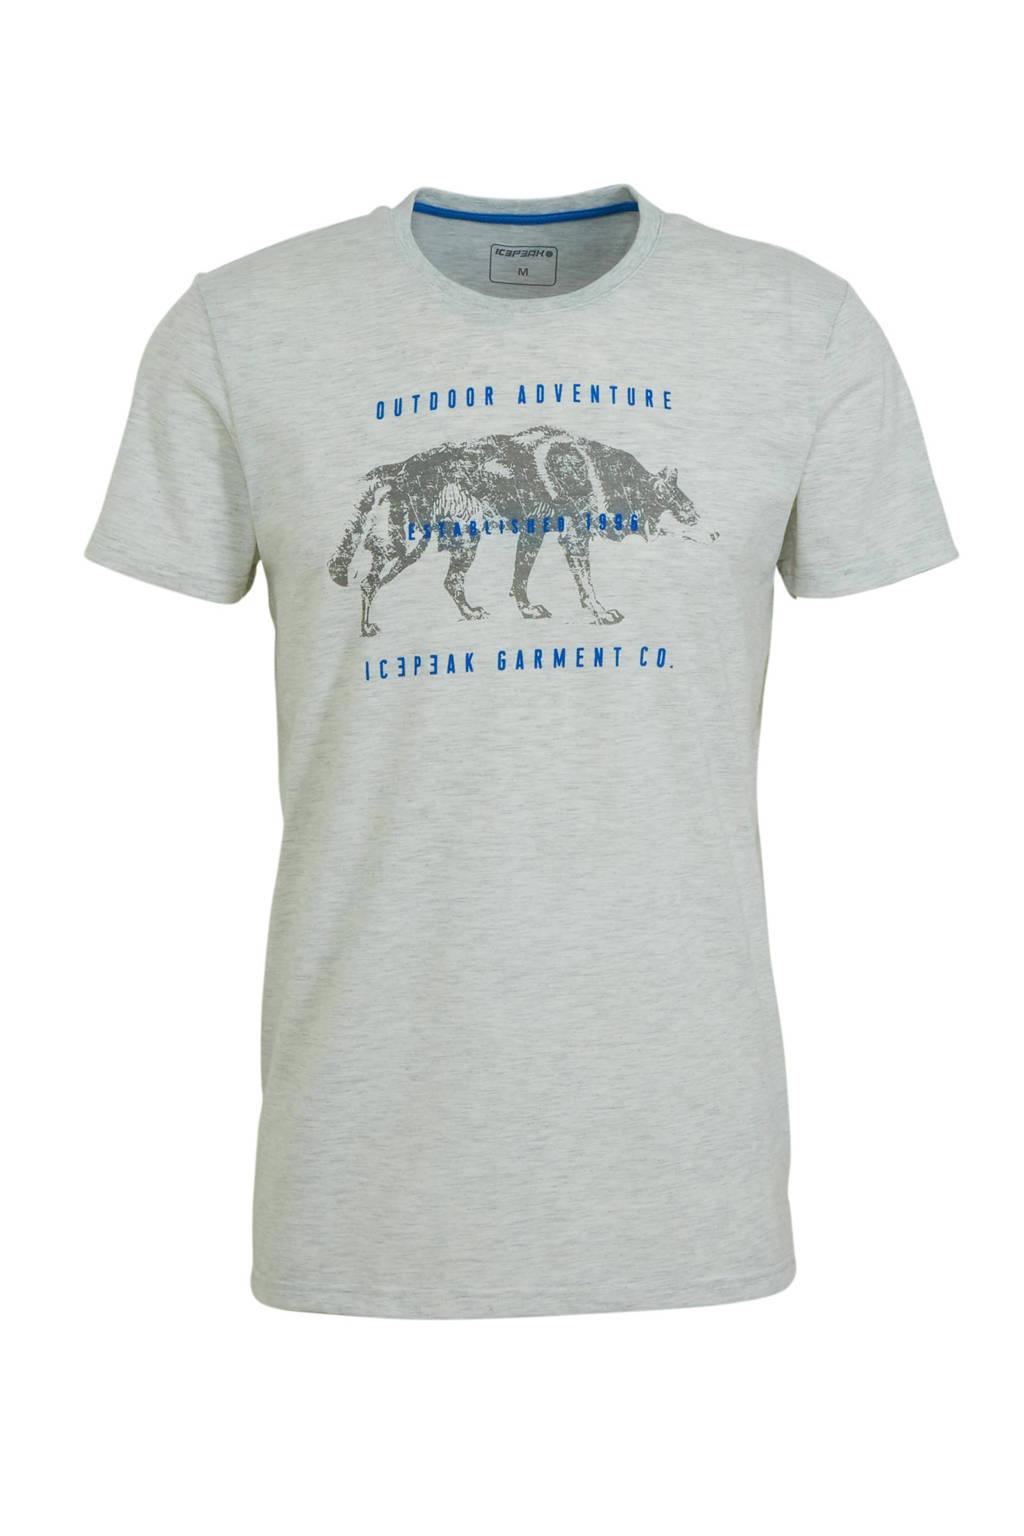 Icepeak outdoor T-shirt Baxter grijs melange, Grijs melange